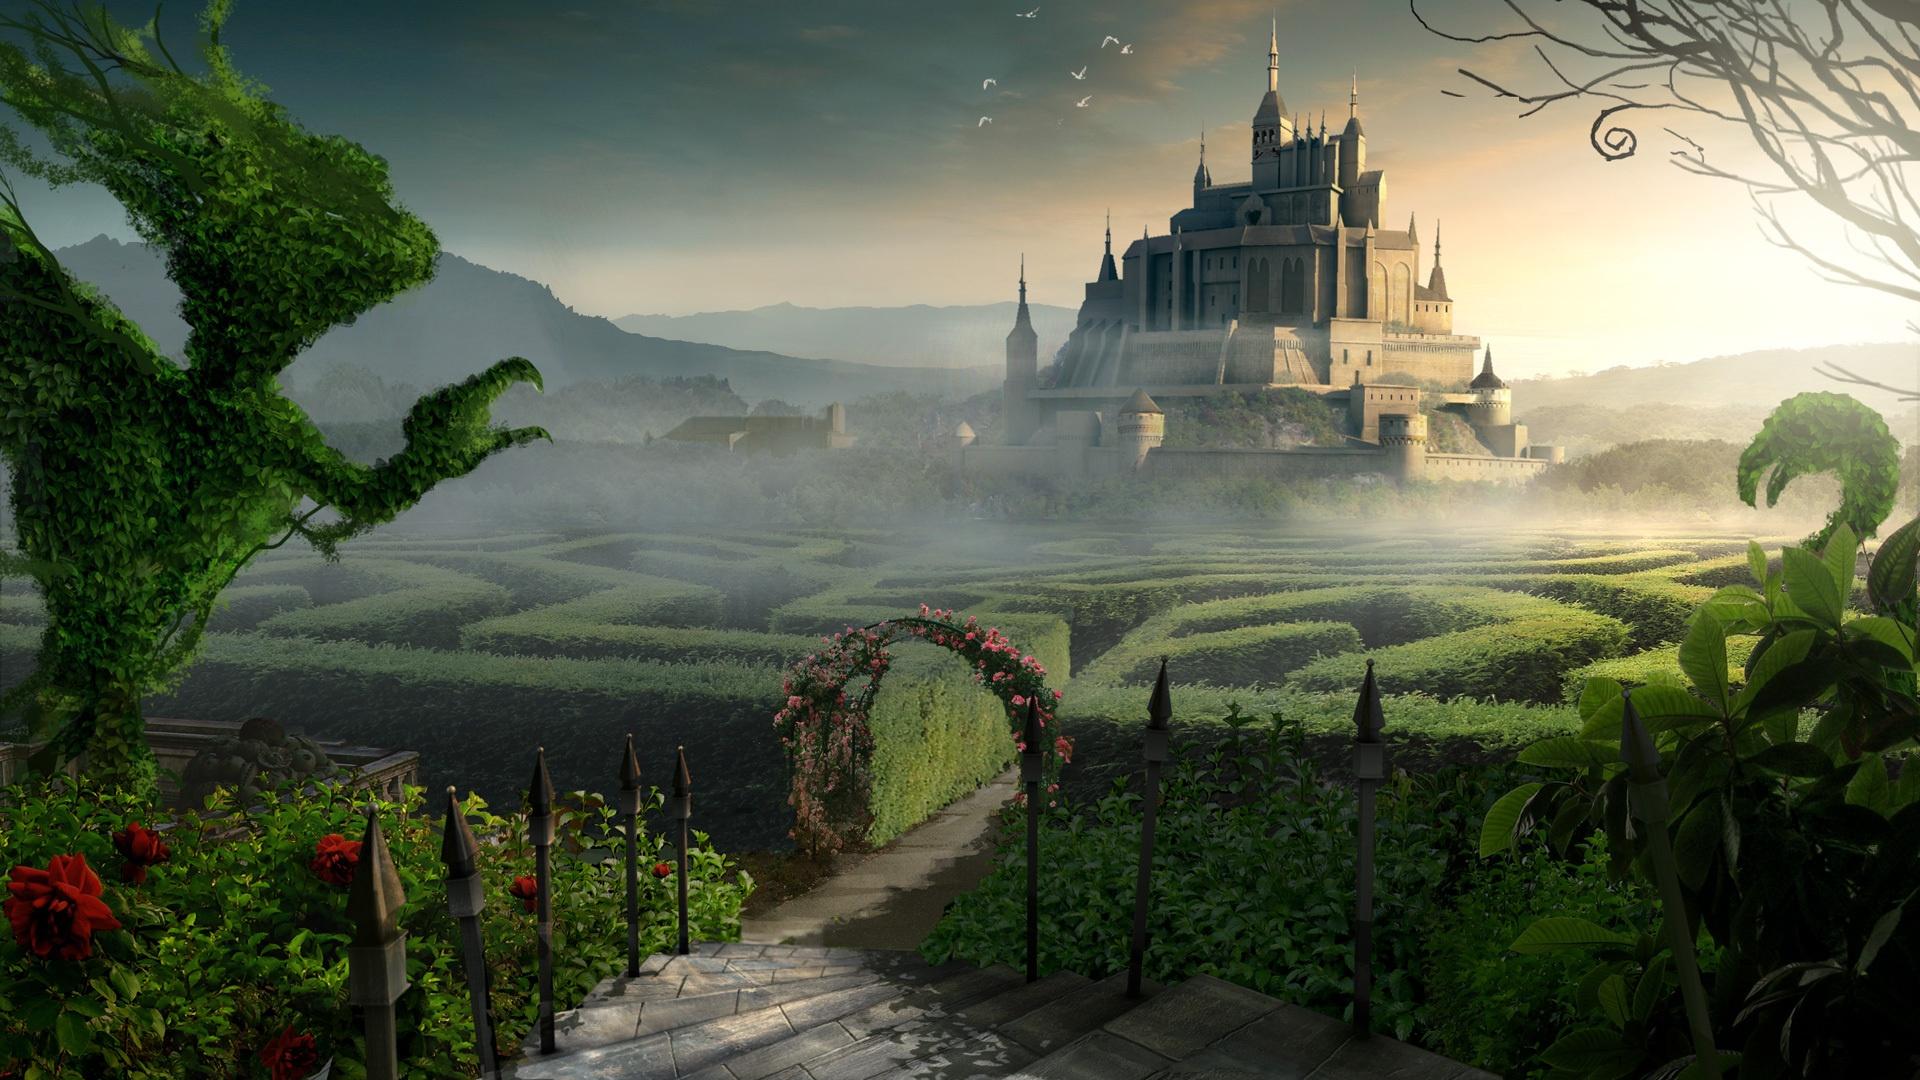 Amazing Wallpaper Harry Potter Nature - latest?cb\u003d20171229002911  Pic_100117.jpg/revision/latest?cb\u003d20171229002911